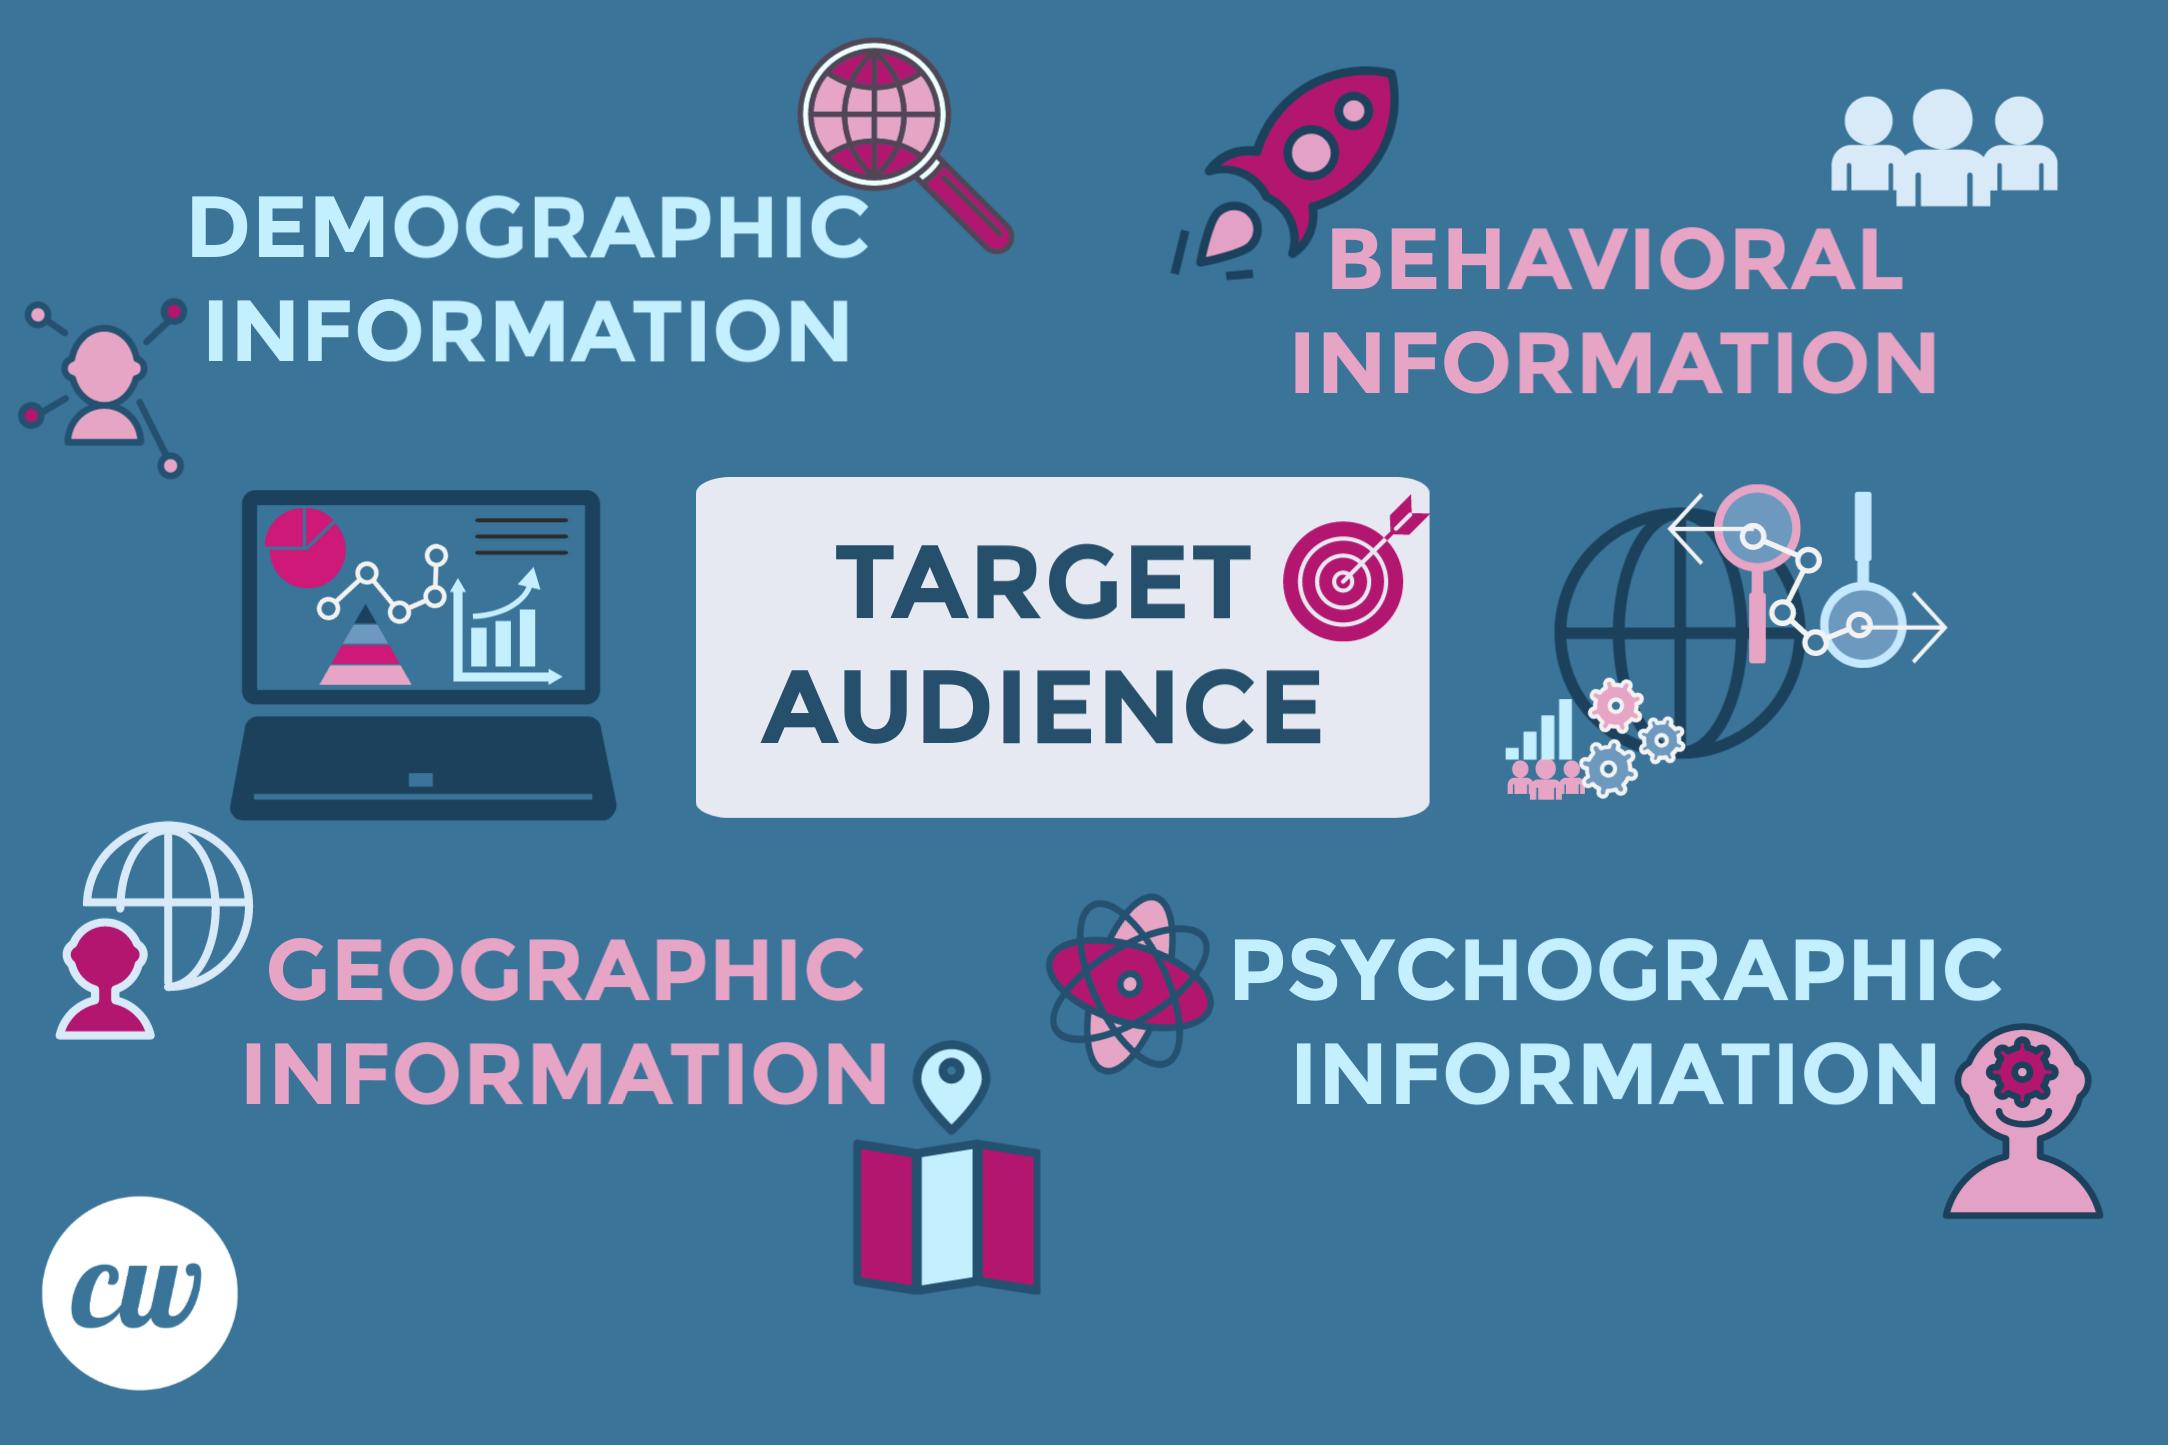 Target audience - demographic information, behavioral information, geographic information, psychographic information